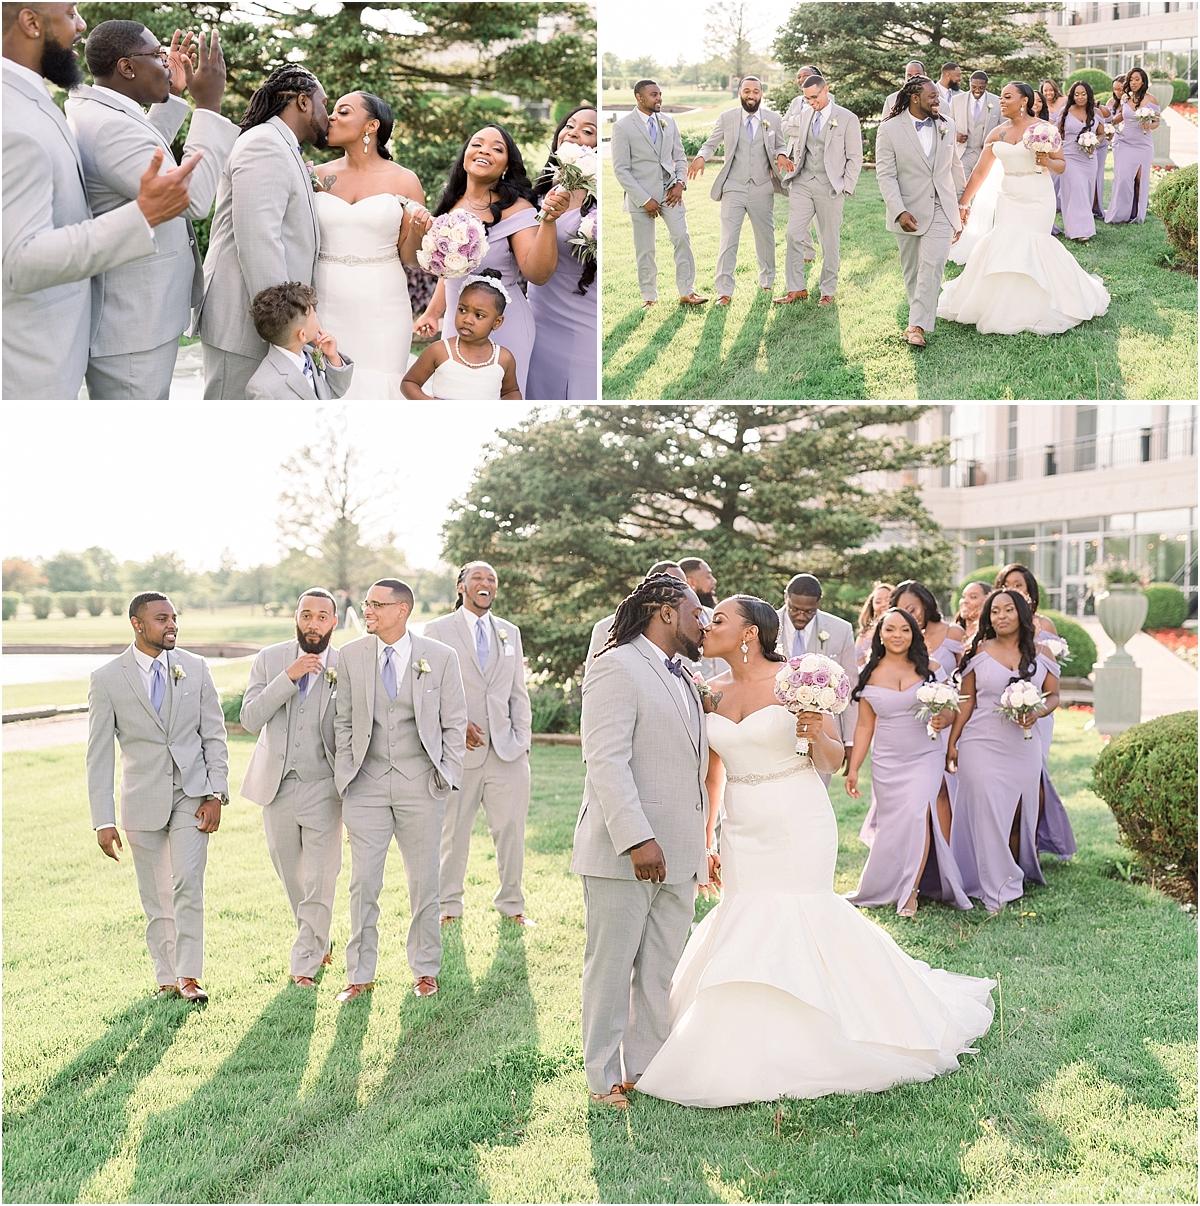 The Odyssey Wedding, Tinley Park Wedding, Chicago Wedding Photographer, Best Photographer In Tineley Park, Best Photographer In Chicago, Light And Airy Photographer_0054.jpg